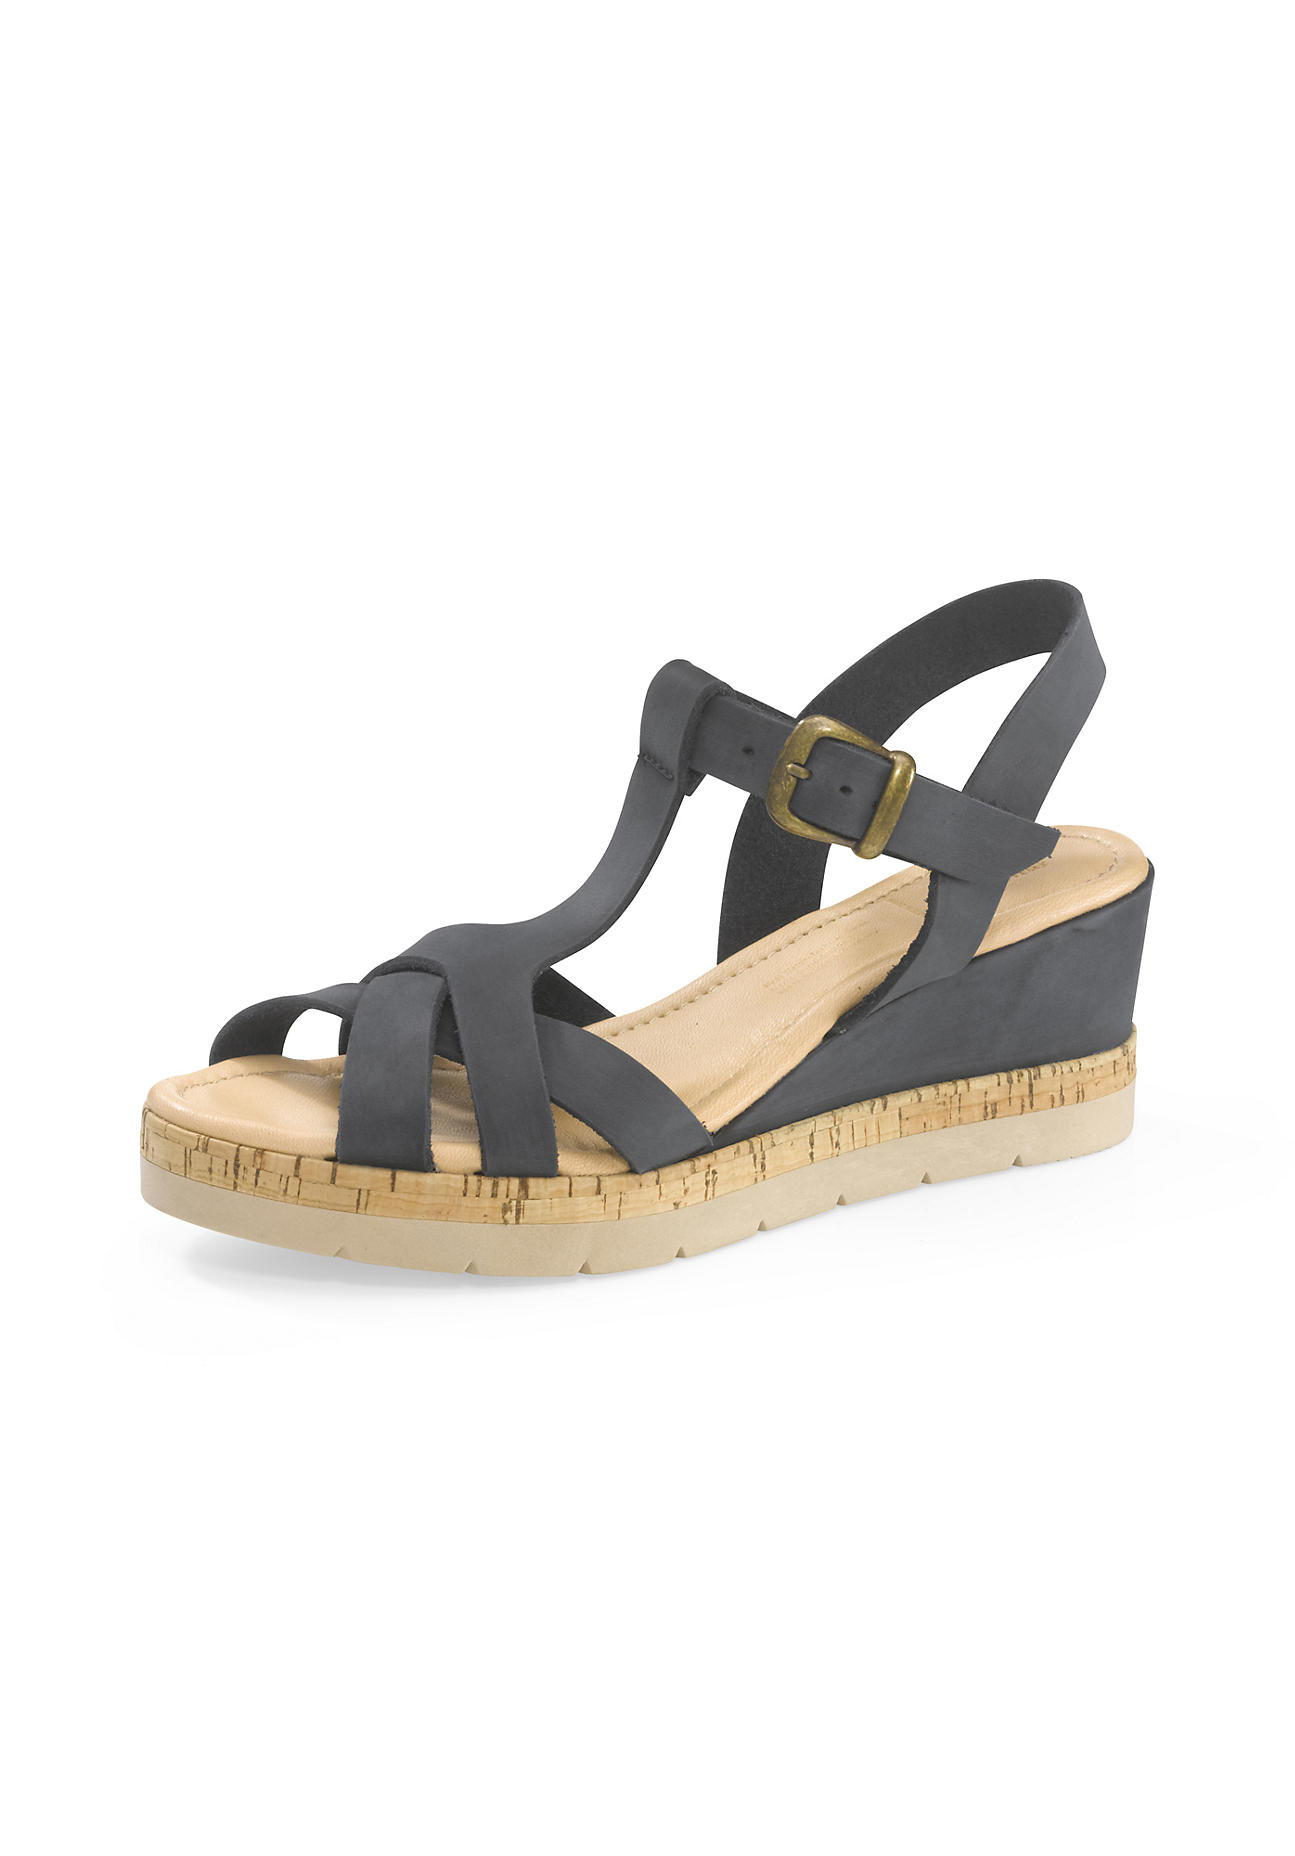 hessnatur Damen Damen Plateau-Sandalette aus Leder – schwarz – Größe 38